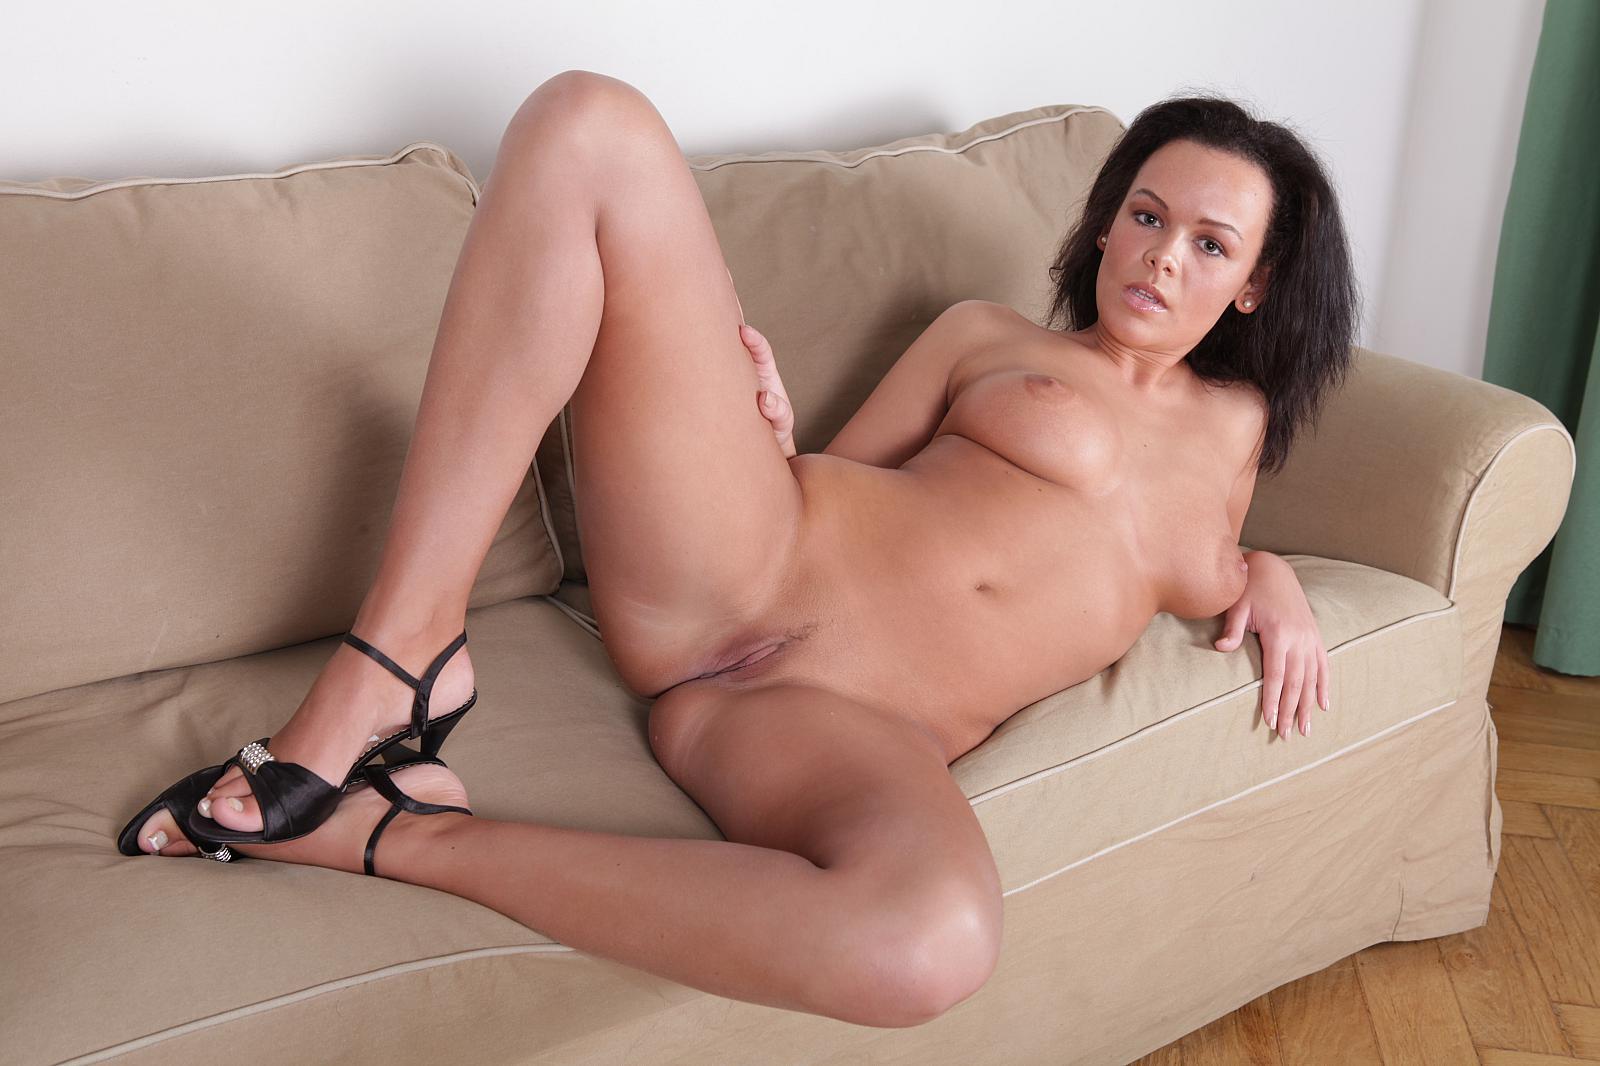 irish mature joy nude ... Linet Slag Mature Euro Babe Linet Slag Moans In Joy As Two Studs Plug Their Dicks